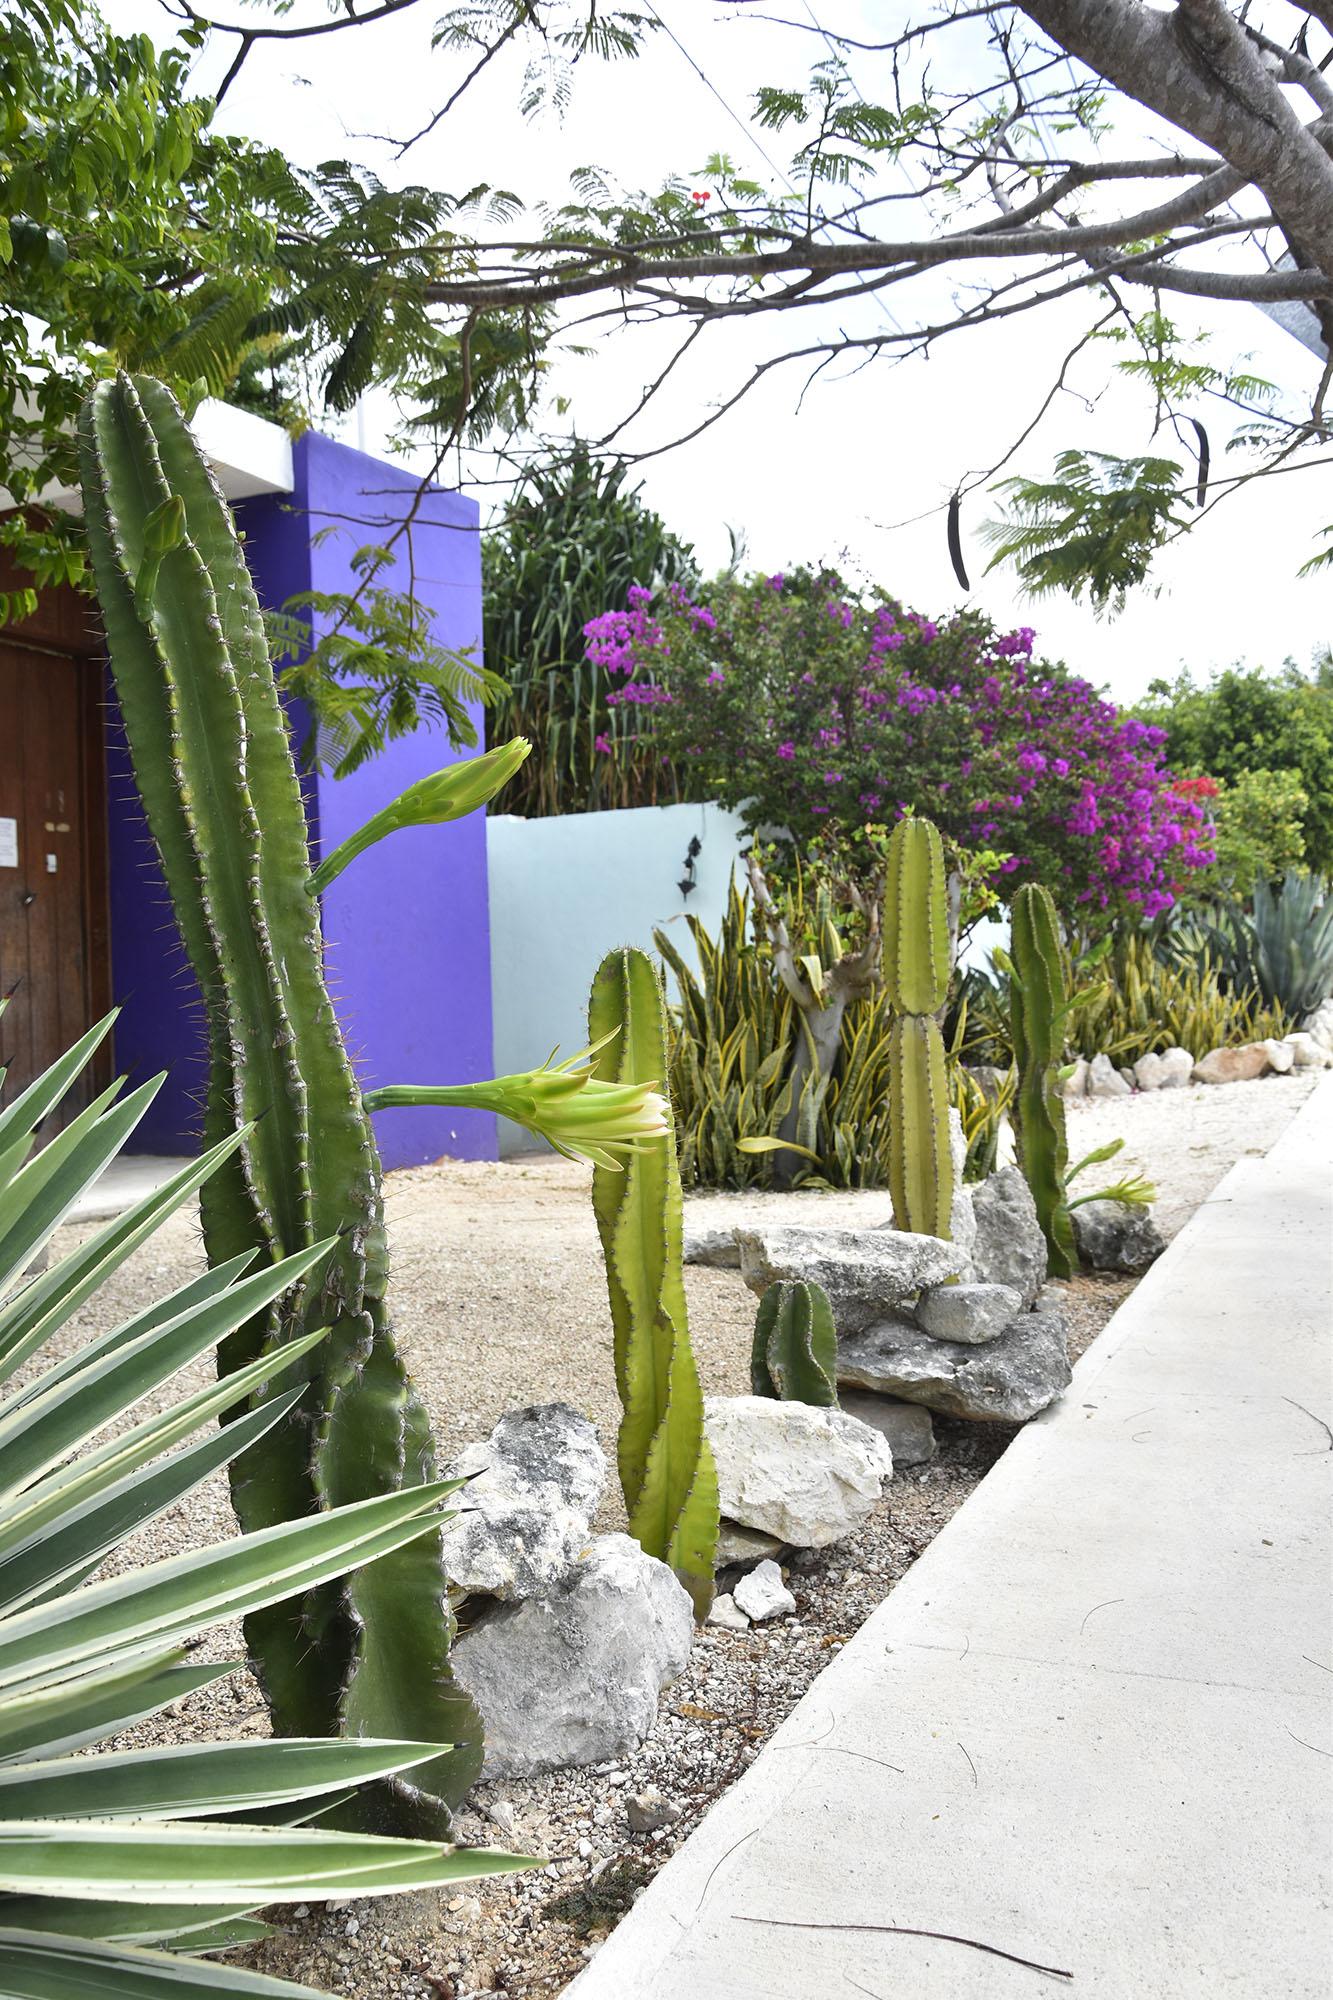 mexico-cactus-pink-tropical